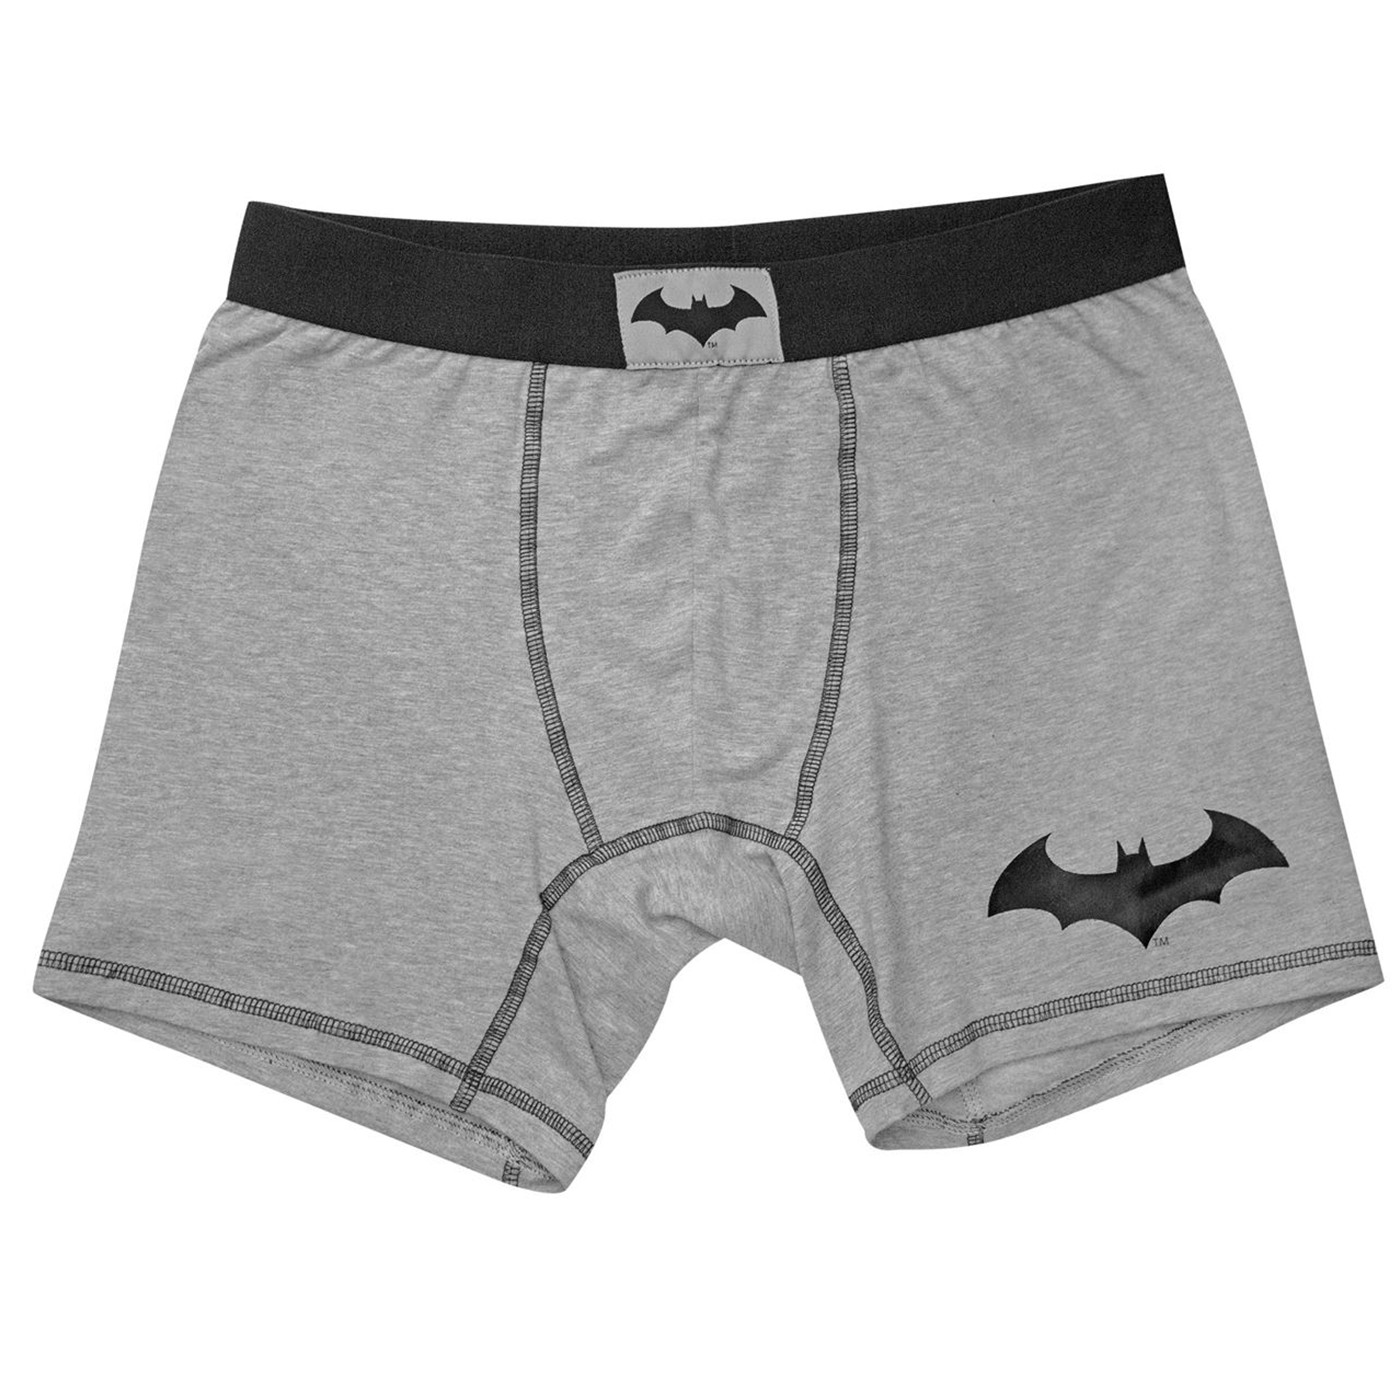 Batman Hush Symbol Men's Underwear Boxer Briefs